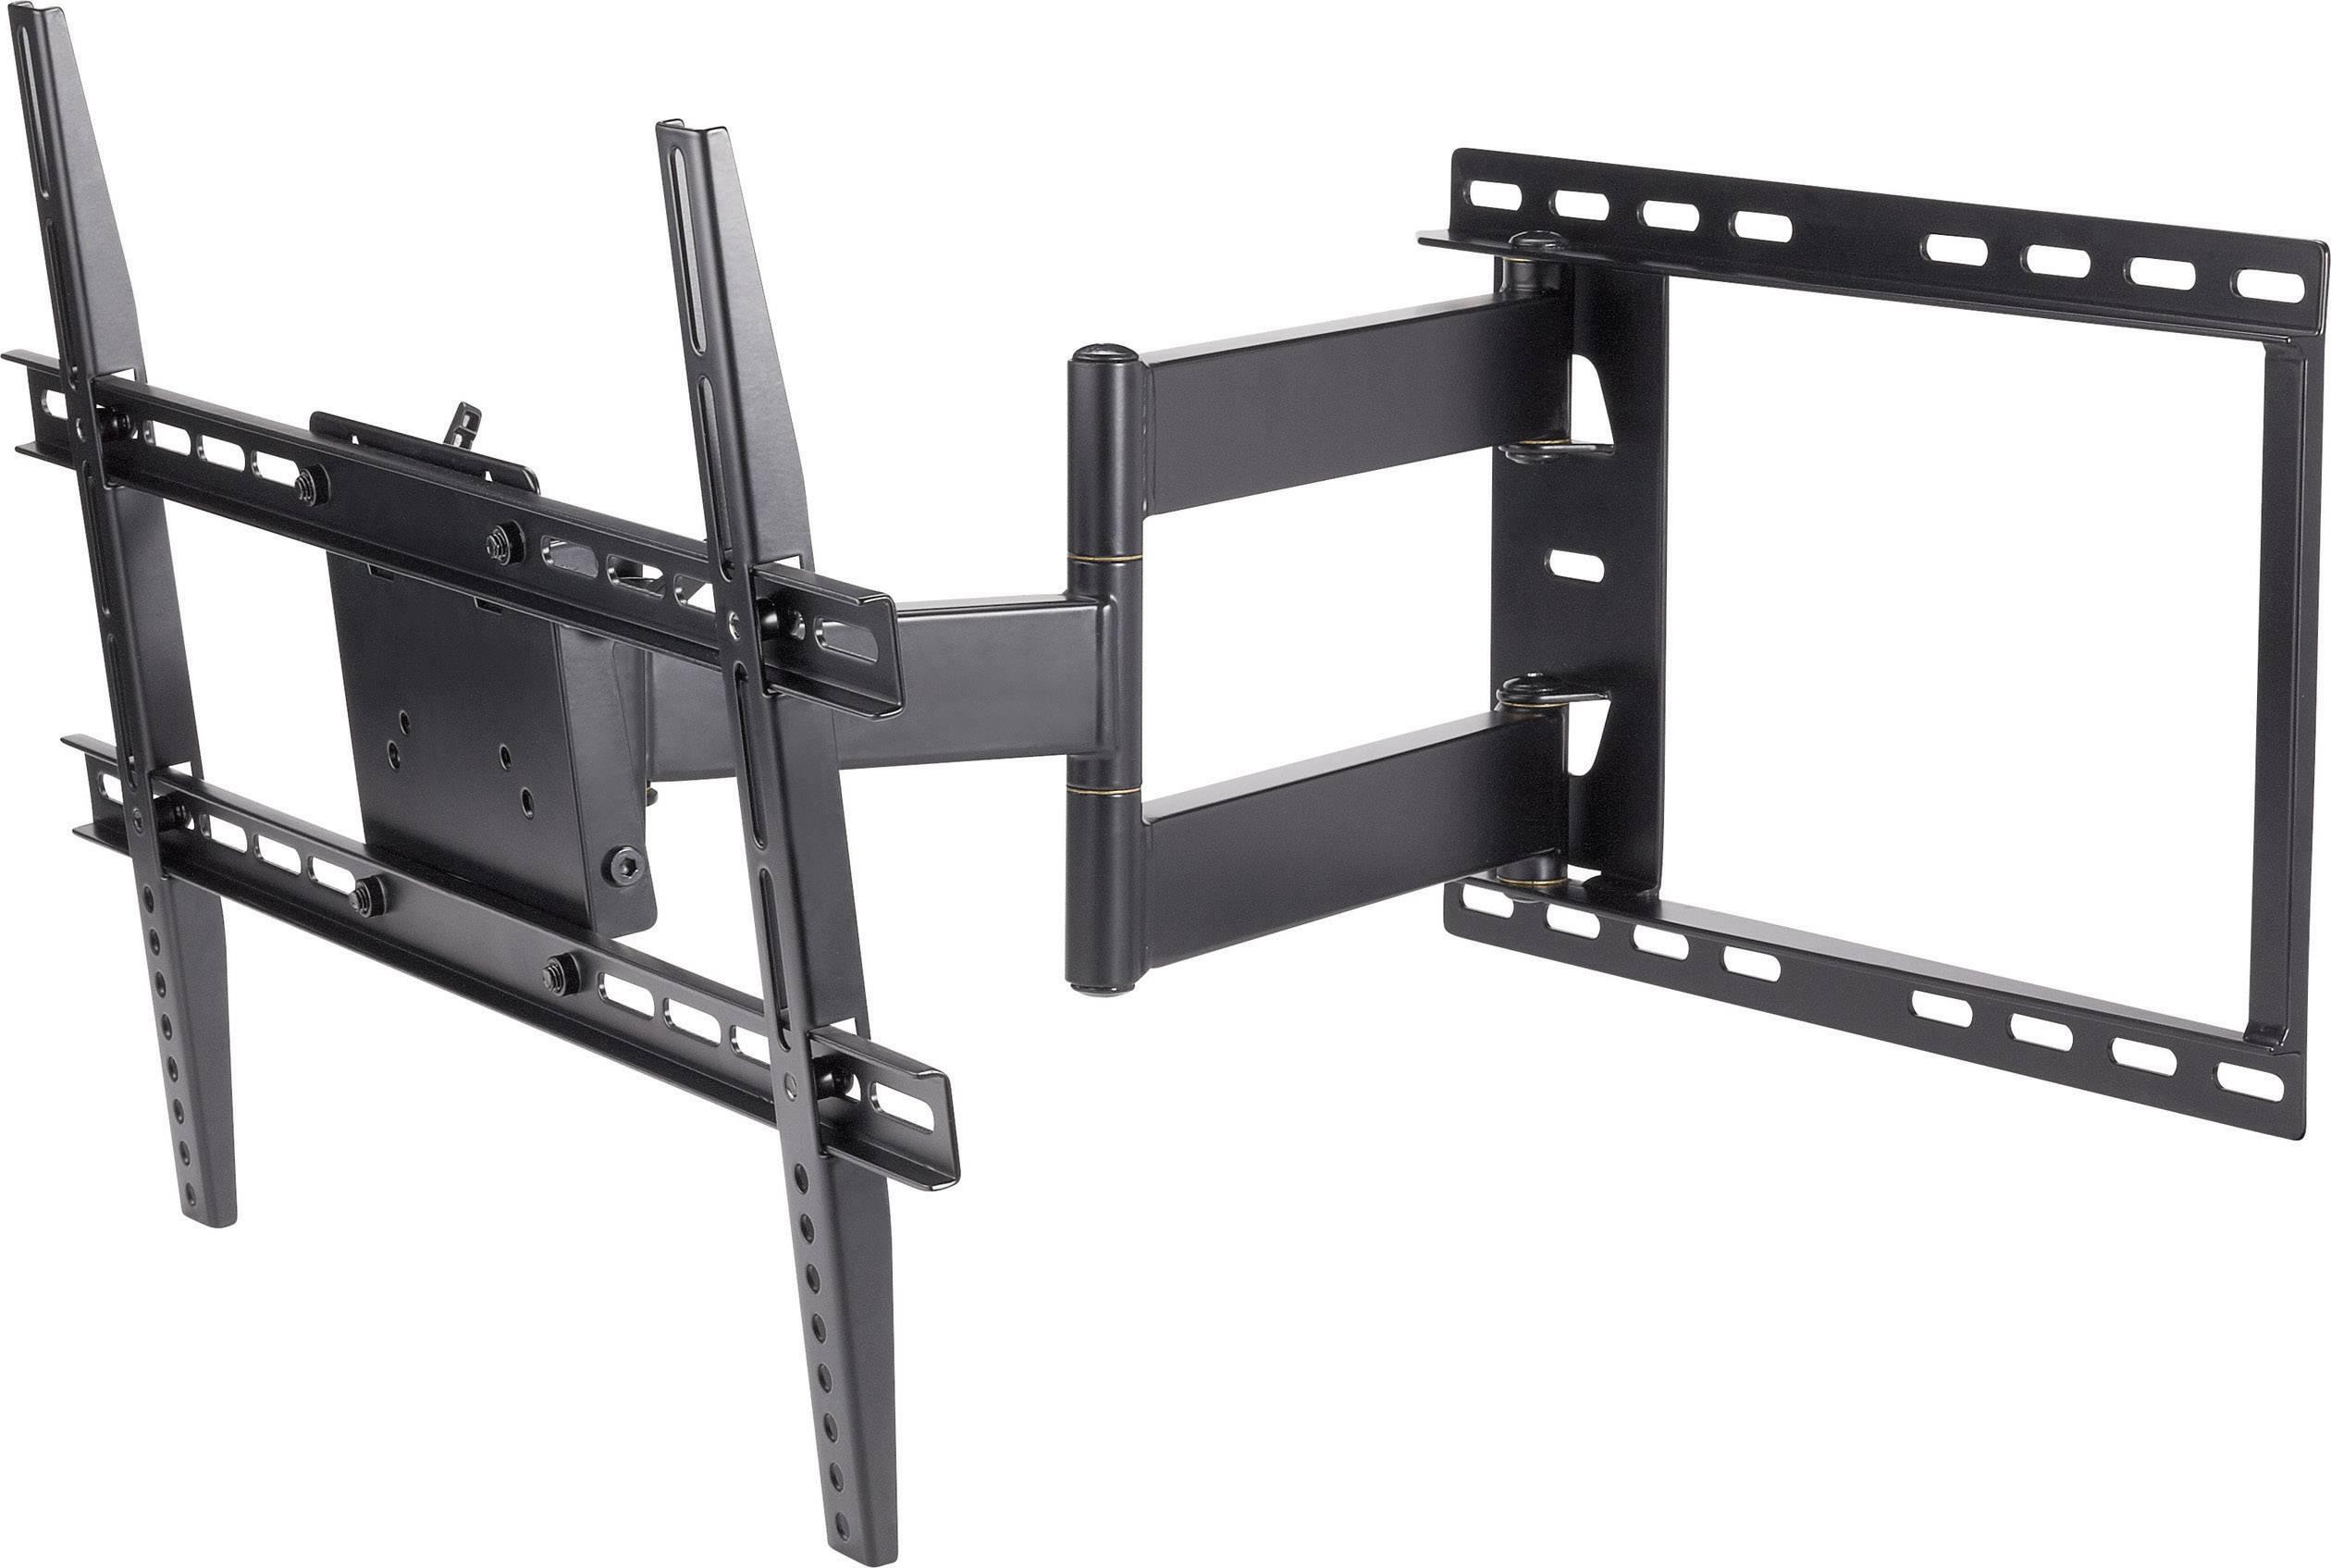 "TV držiak na stenu SpeaKa Professional 527504, naklápací + nakláňací, 66,0 cm (26"") - 139,7 cm (55"")"